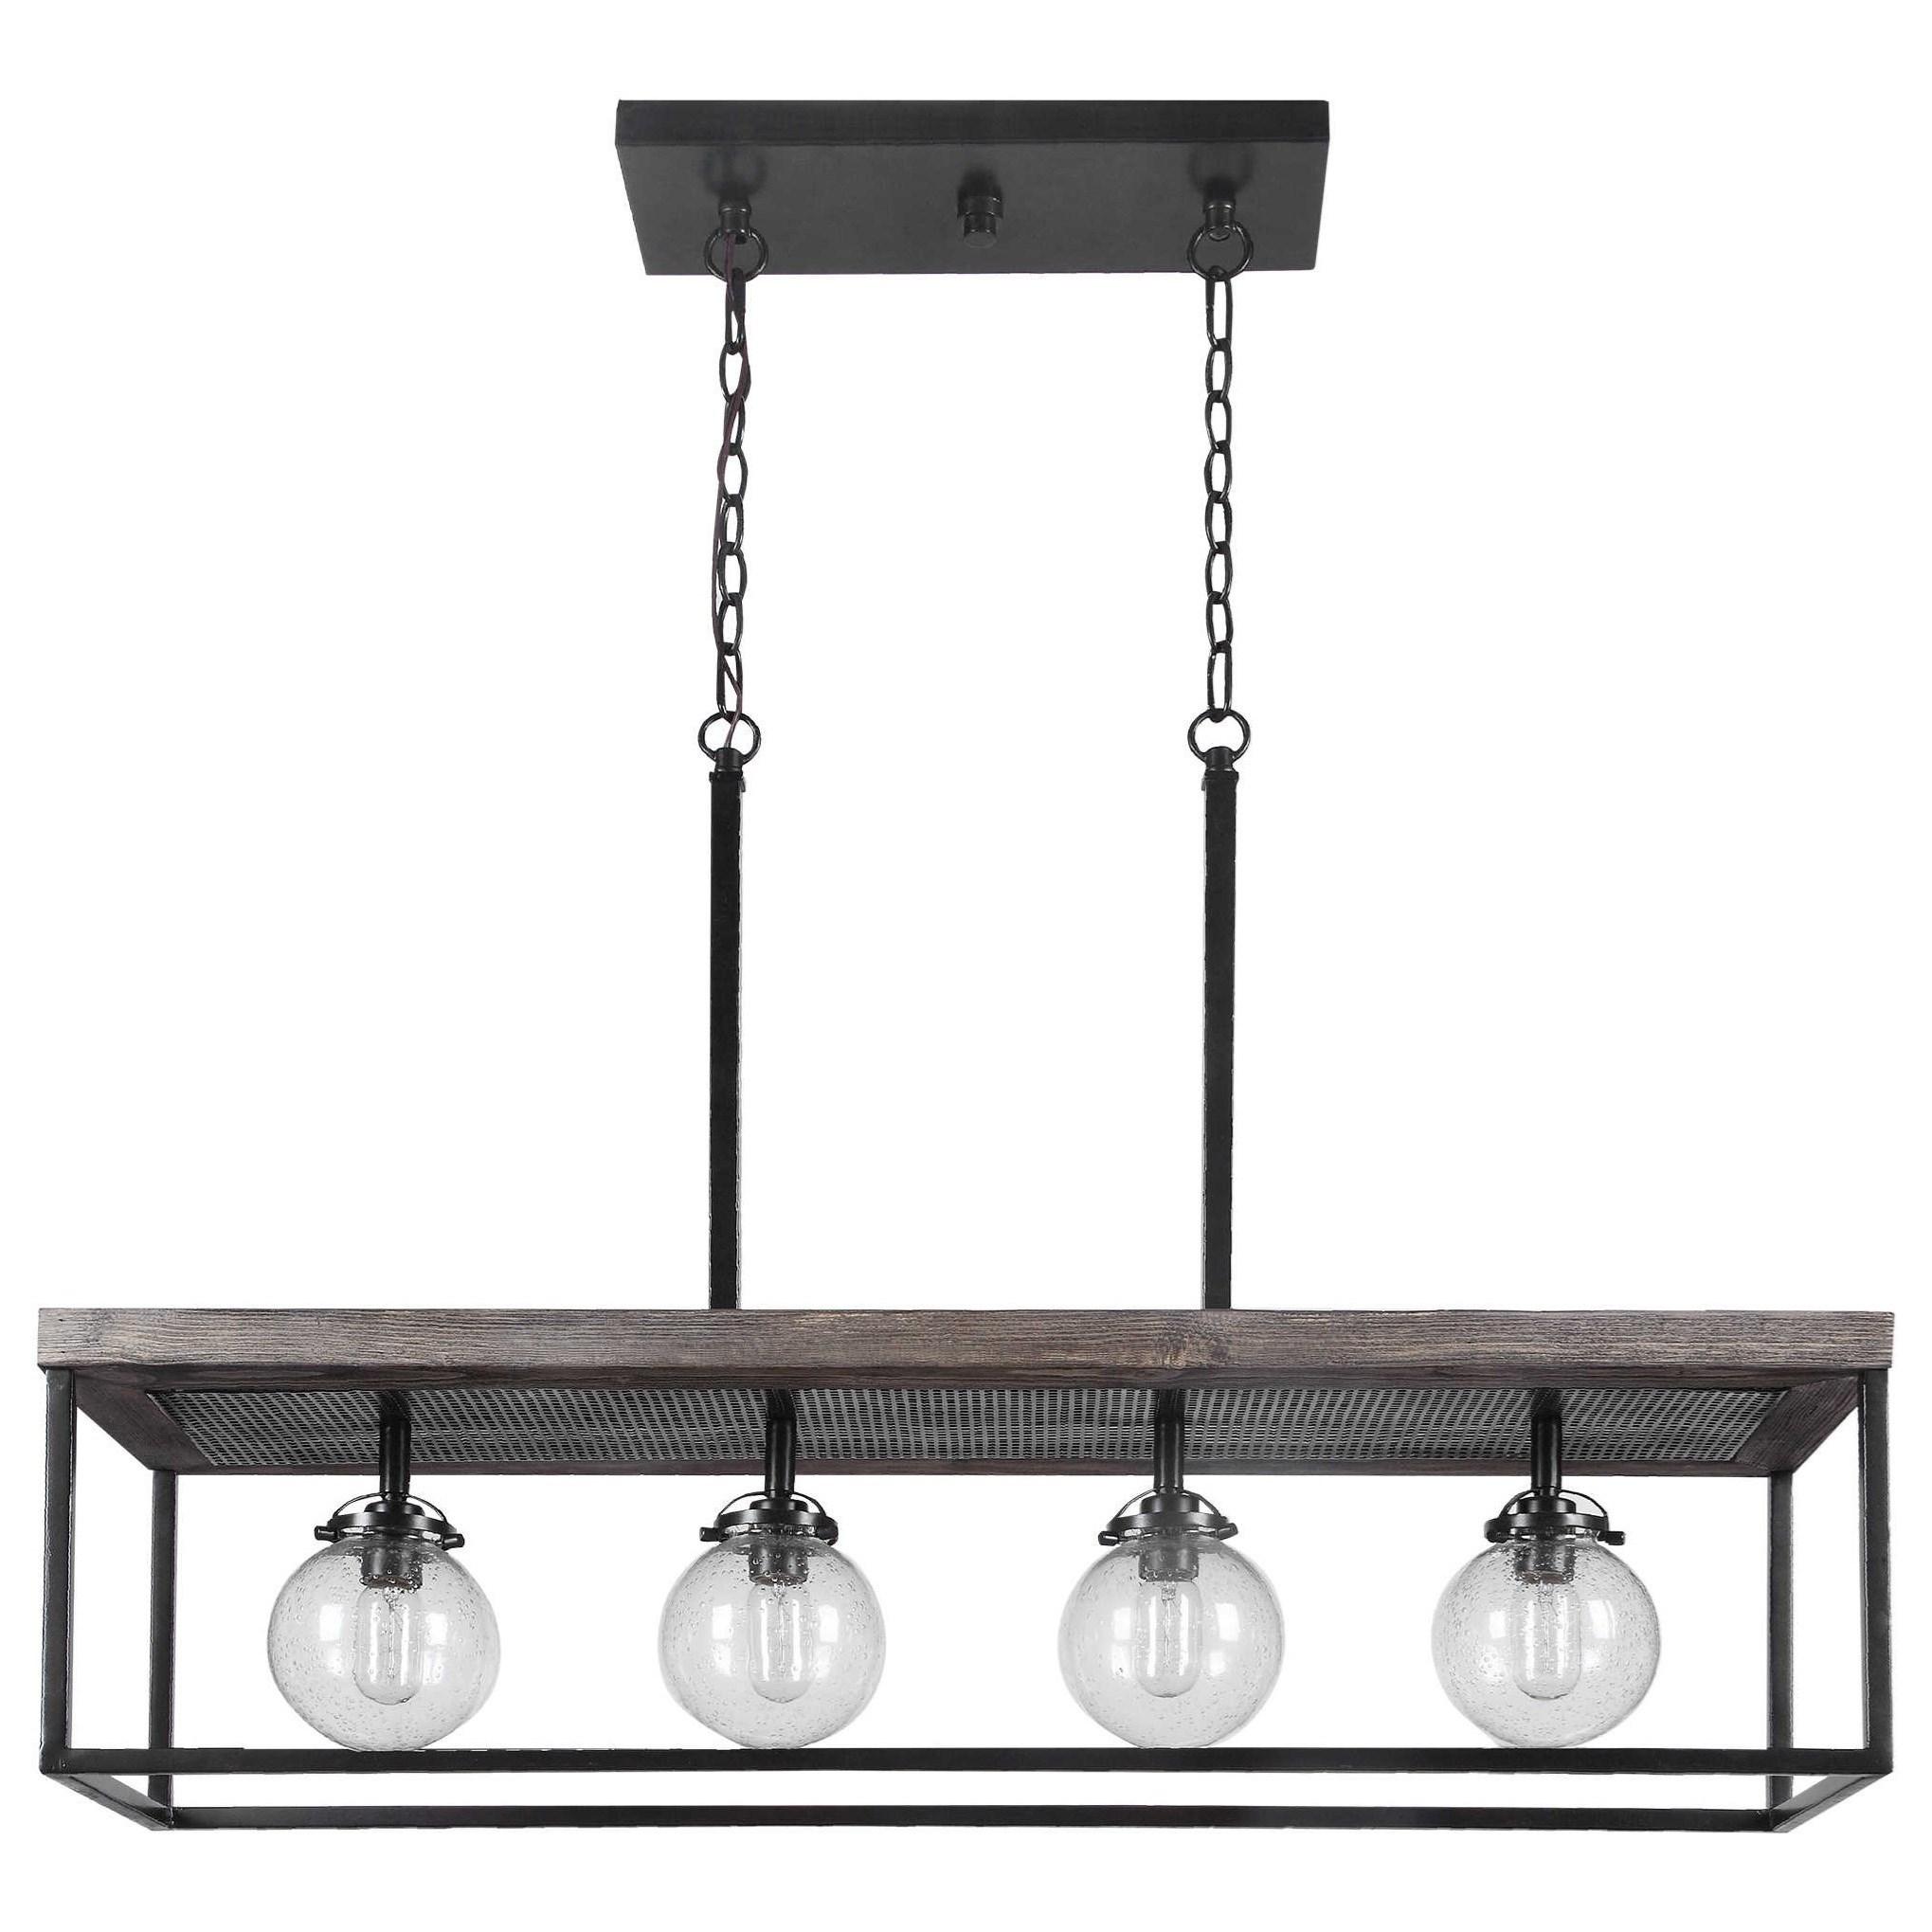 lighting fixtures pendant lights pearsall 4 light industrial island light